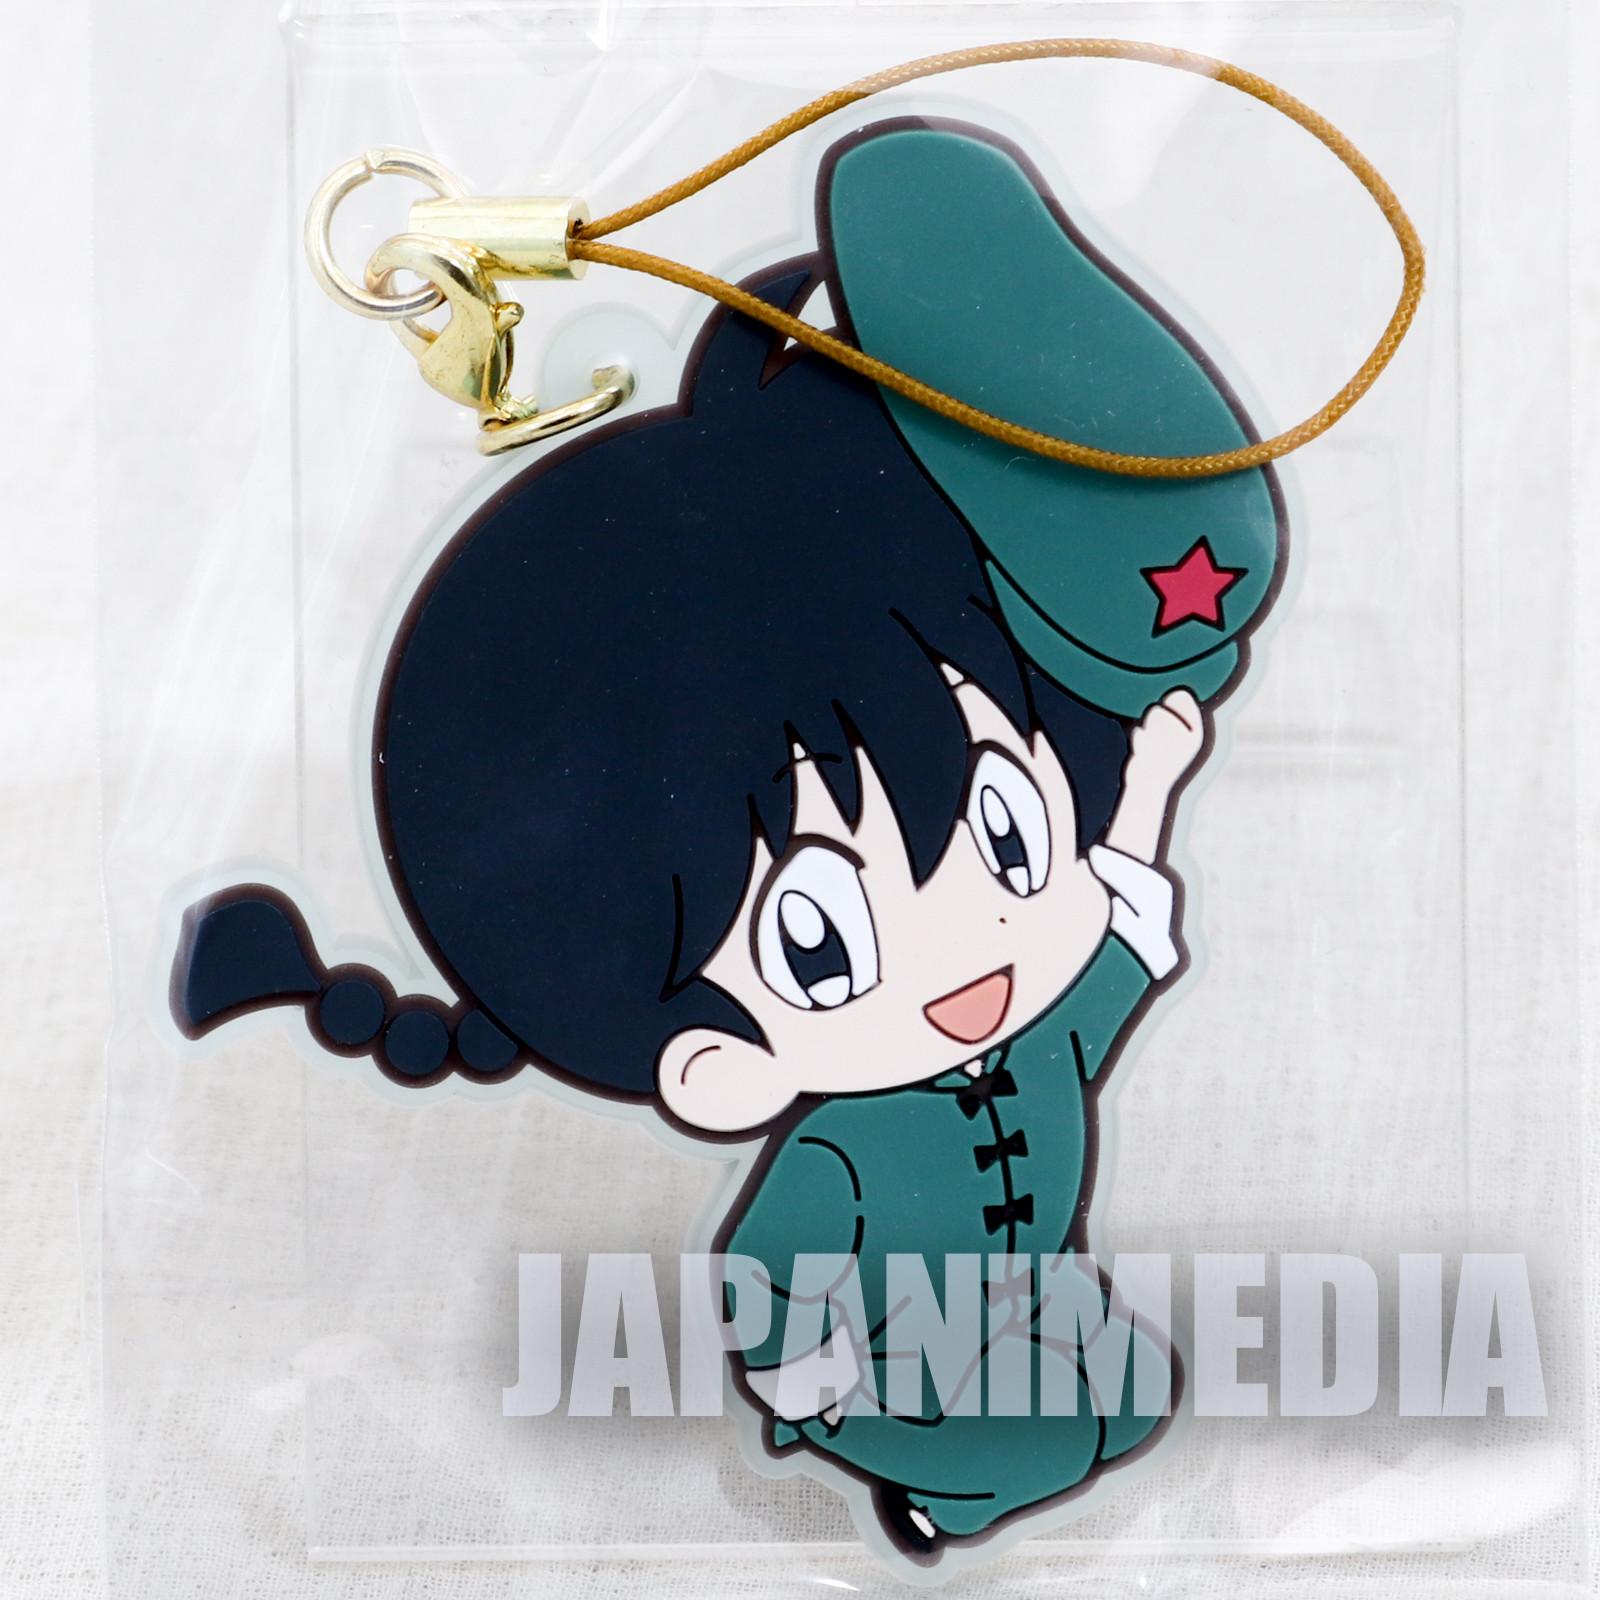 Ranma 1/2 Male Ranma Saotome #2 Mascot Rubber Strap JAPAN ANIME MANGA